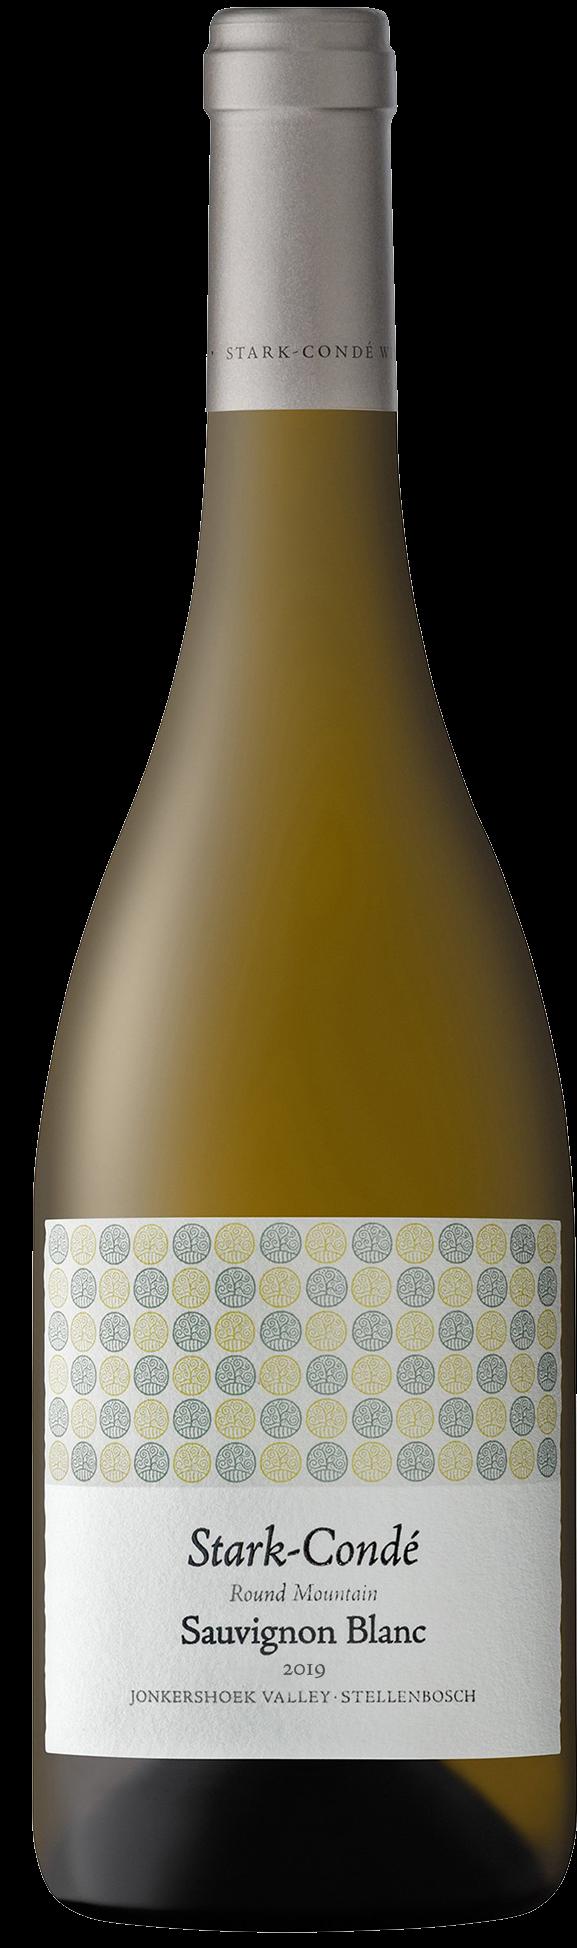 Stark-Condé Round Mountain Sauvignon Blanc